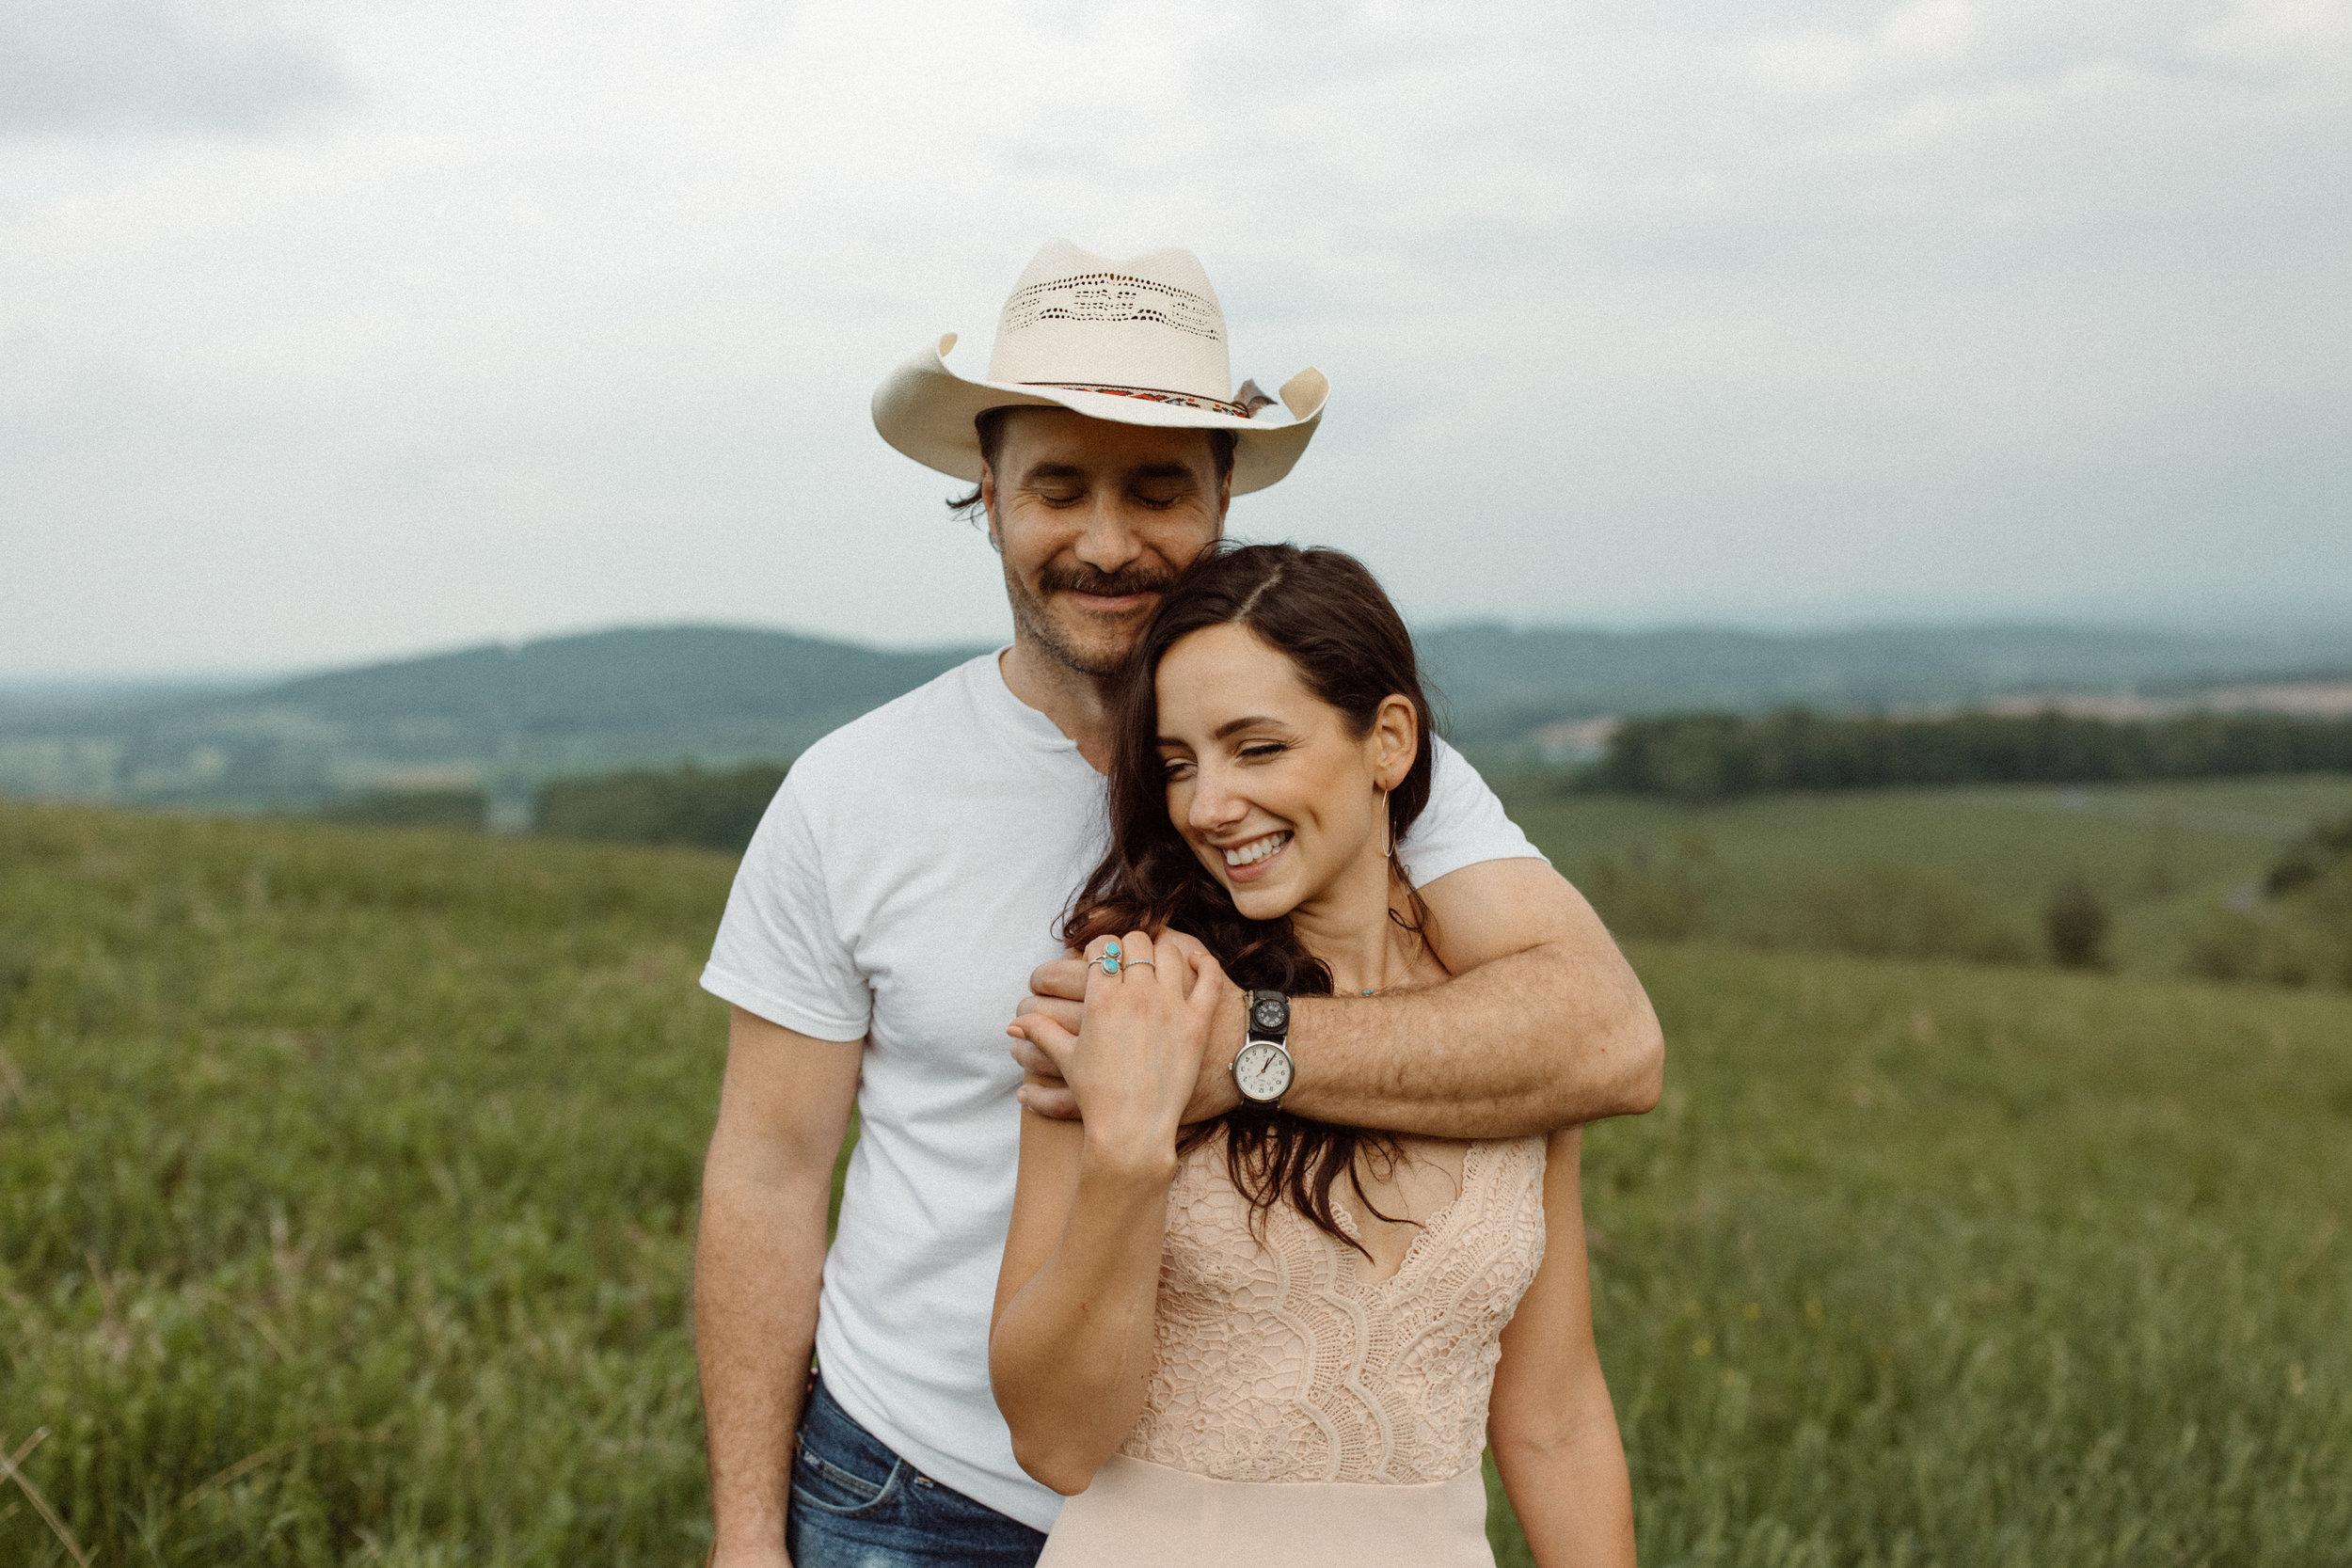 kelsey&mark-engagement-skymeadows-2019-peytoncurry-9353.jpg